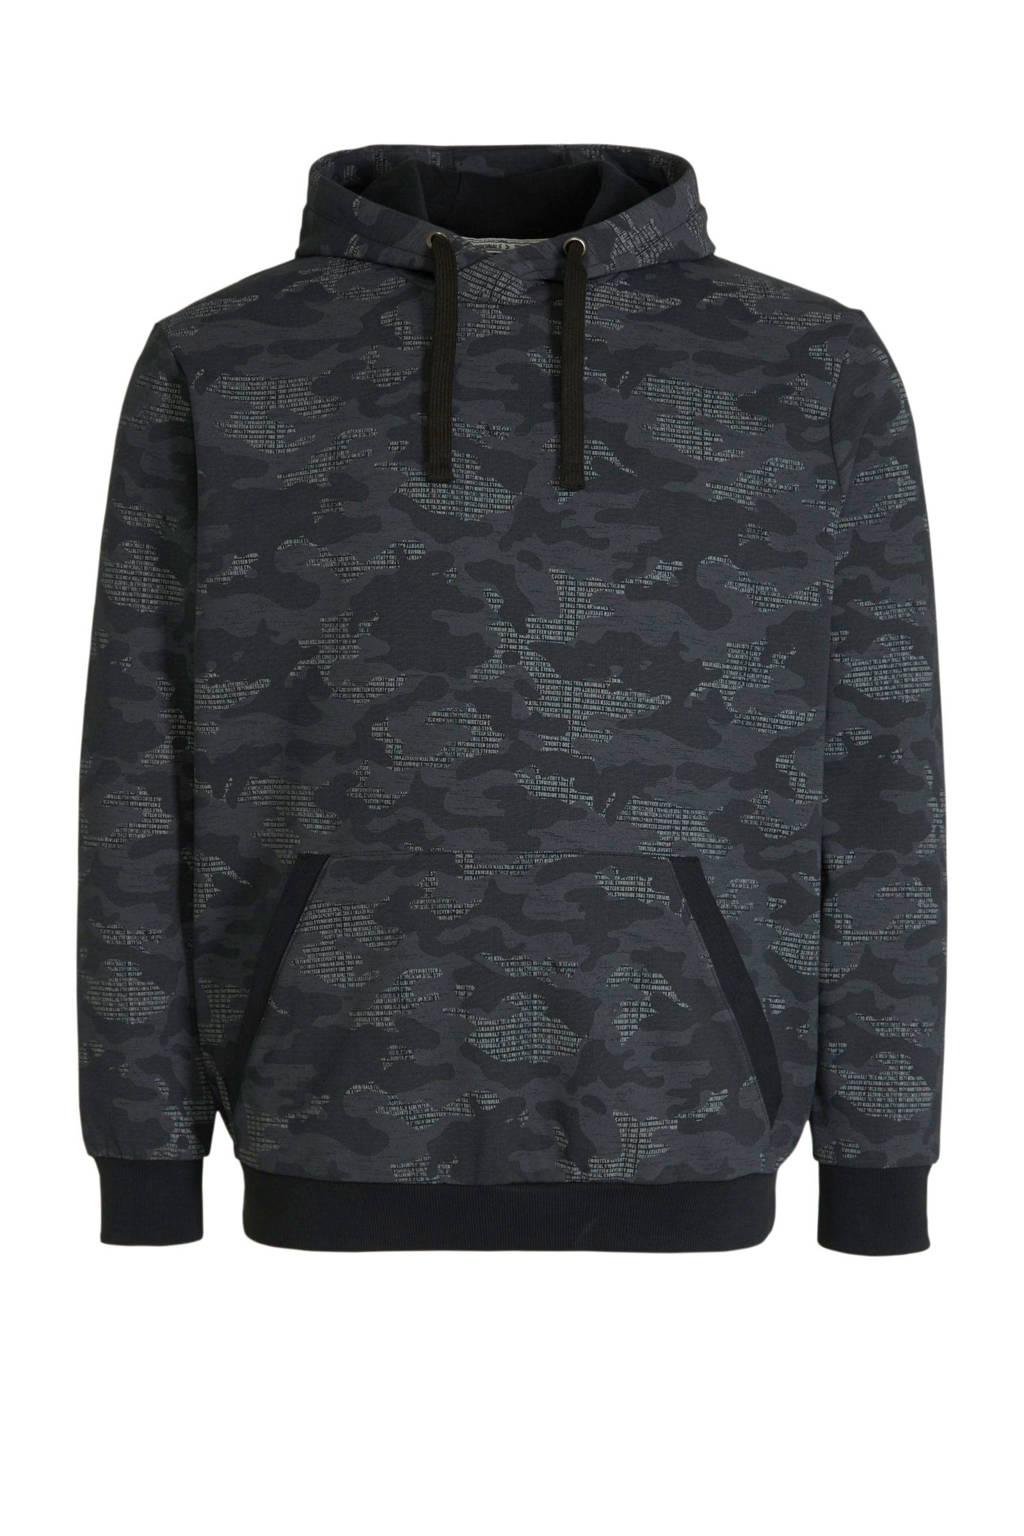 C&A XL Angelo Litrico hoodie met all over print zwart, Zwart